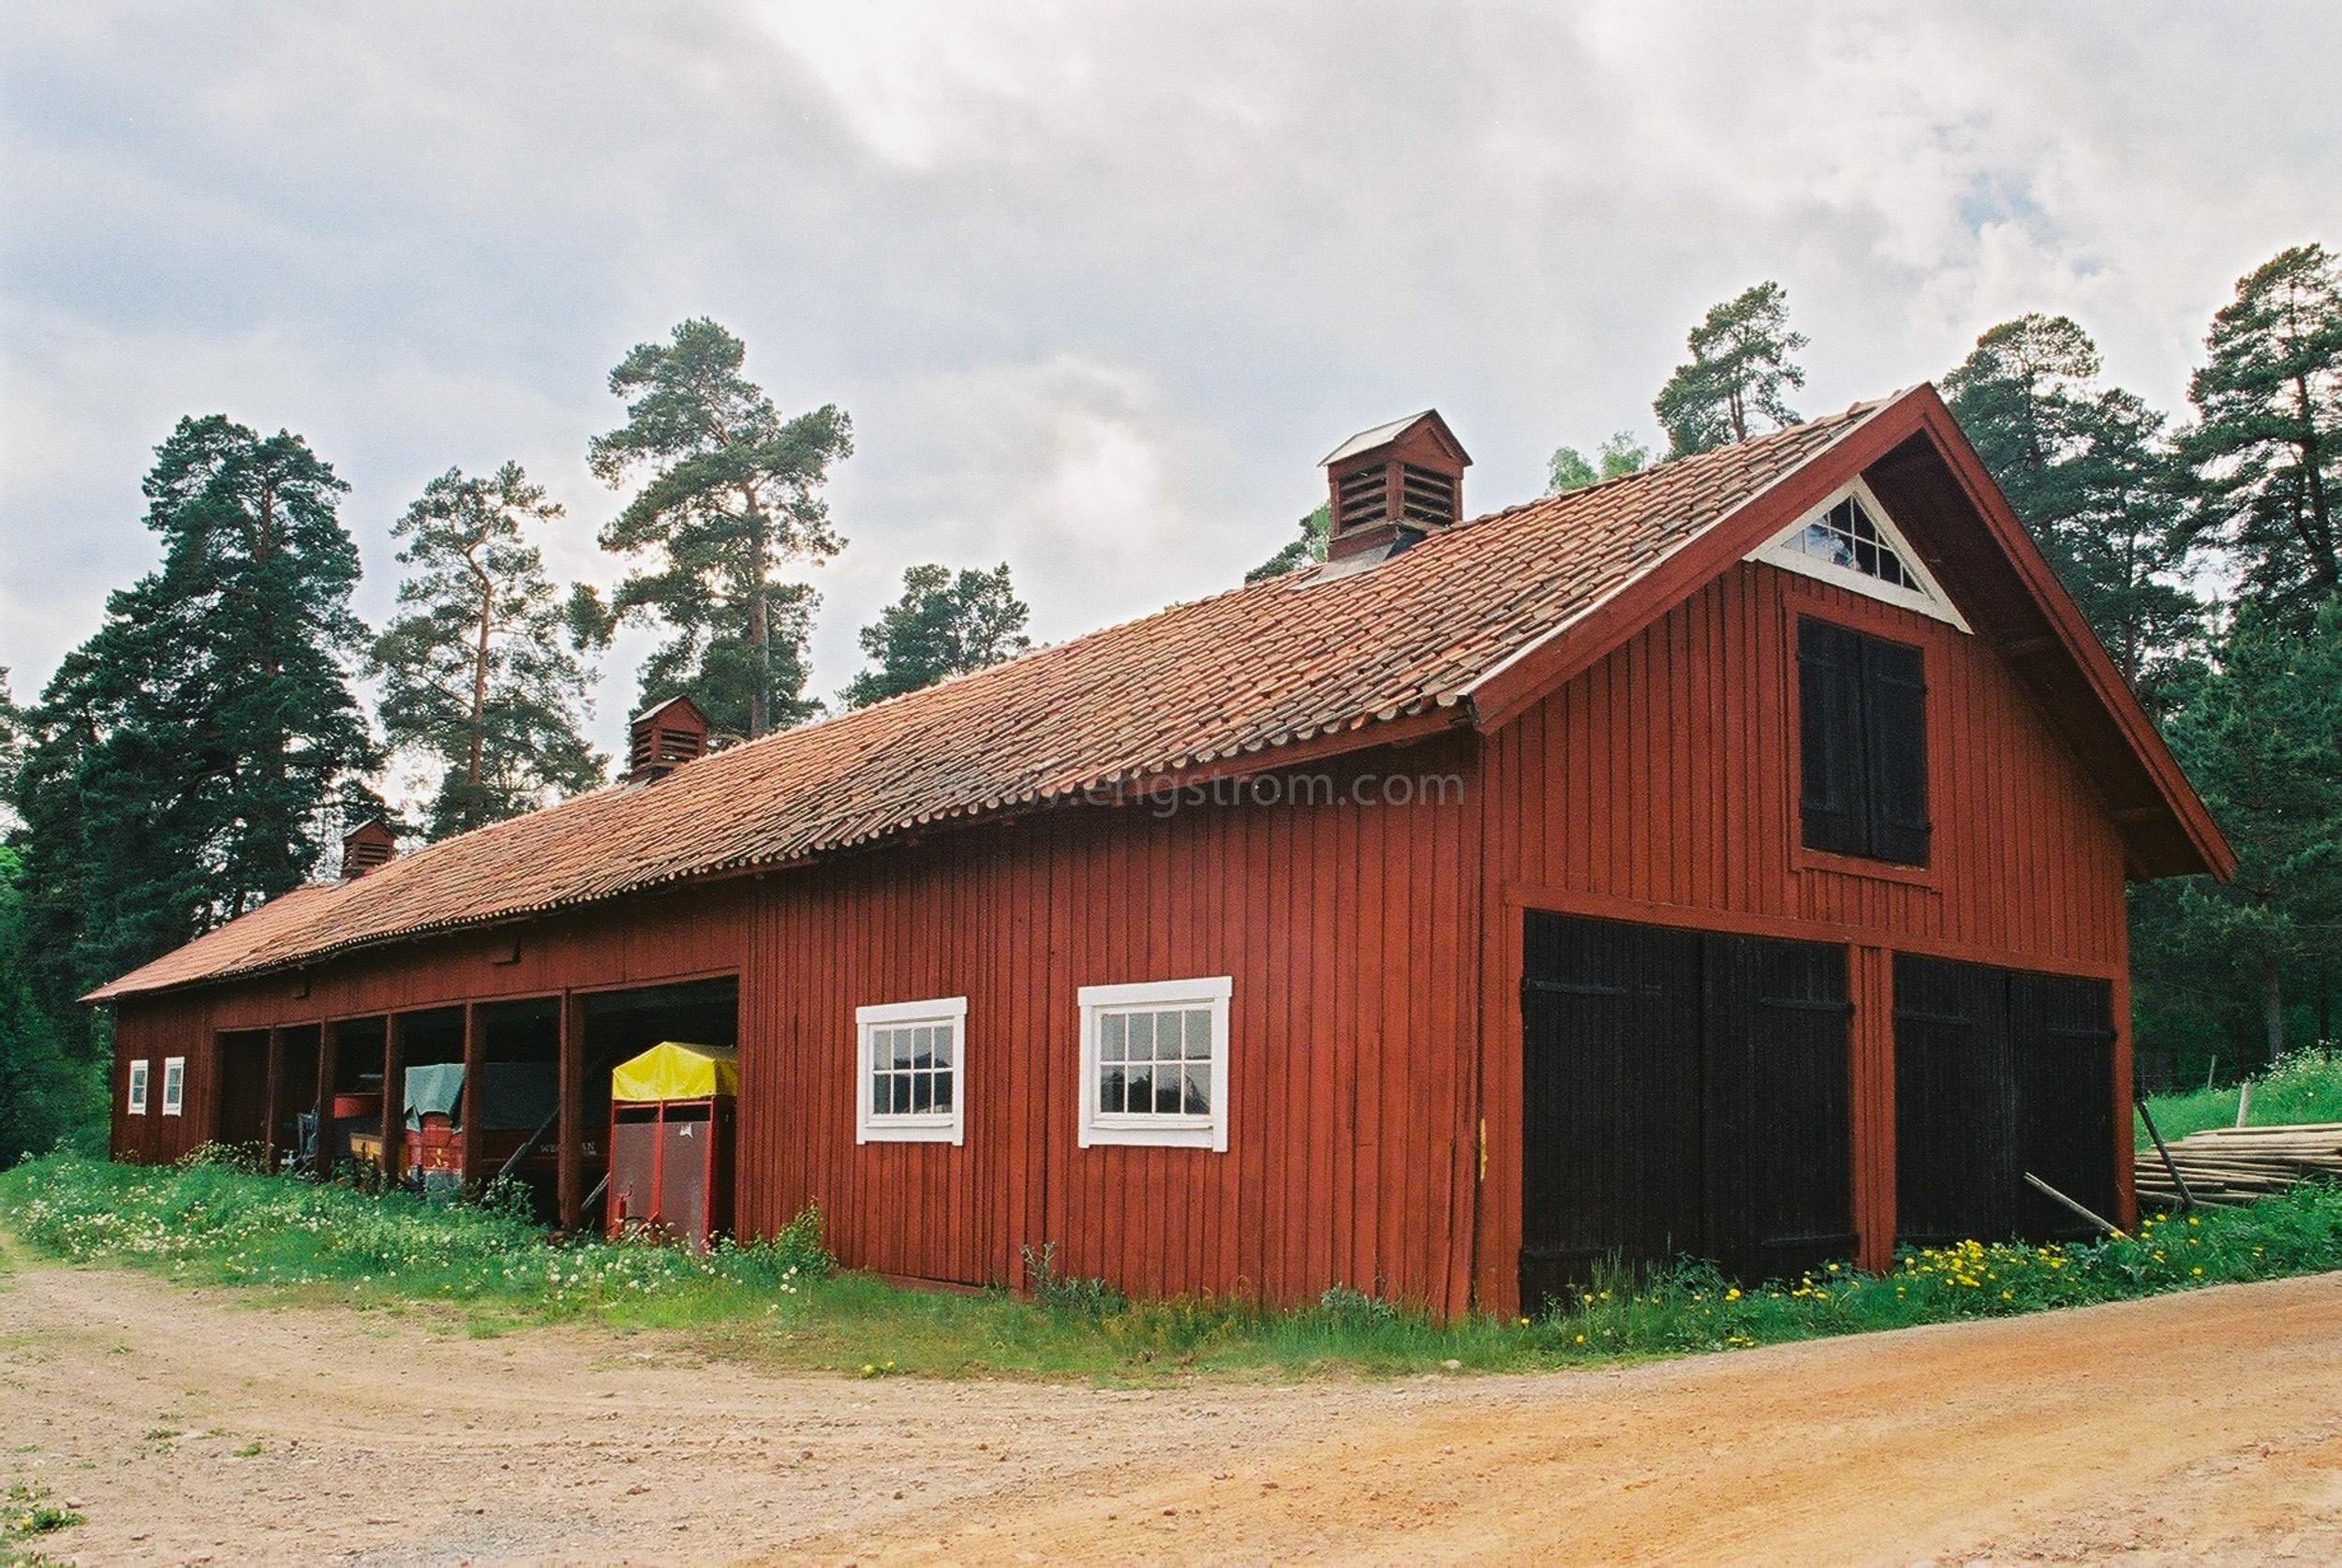 JE0205_07, Vagnslider, Jonas Engström